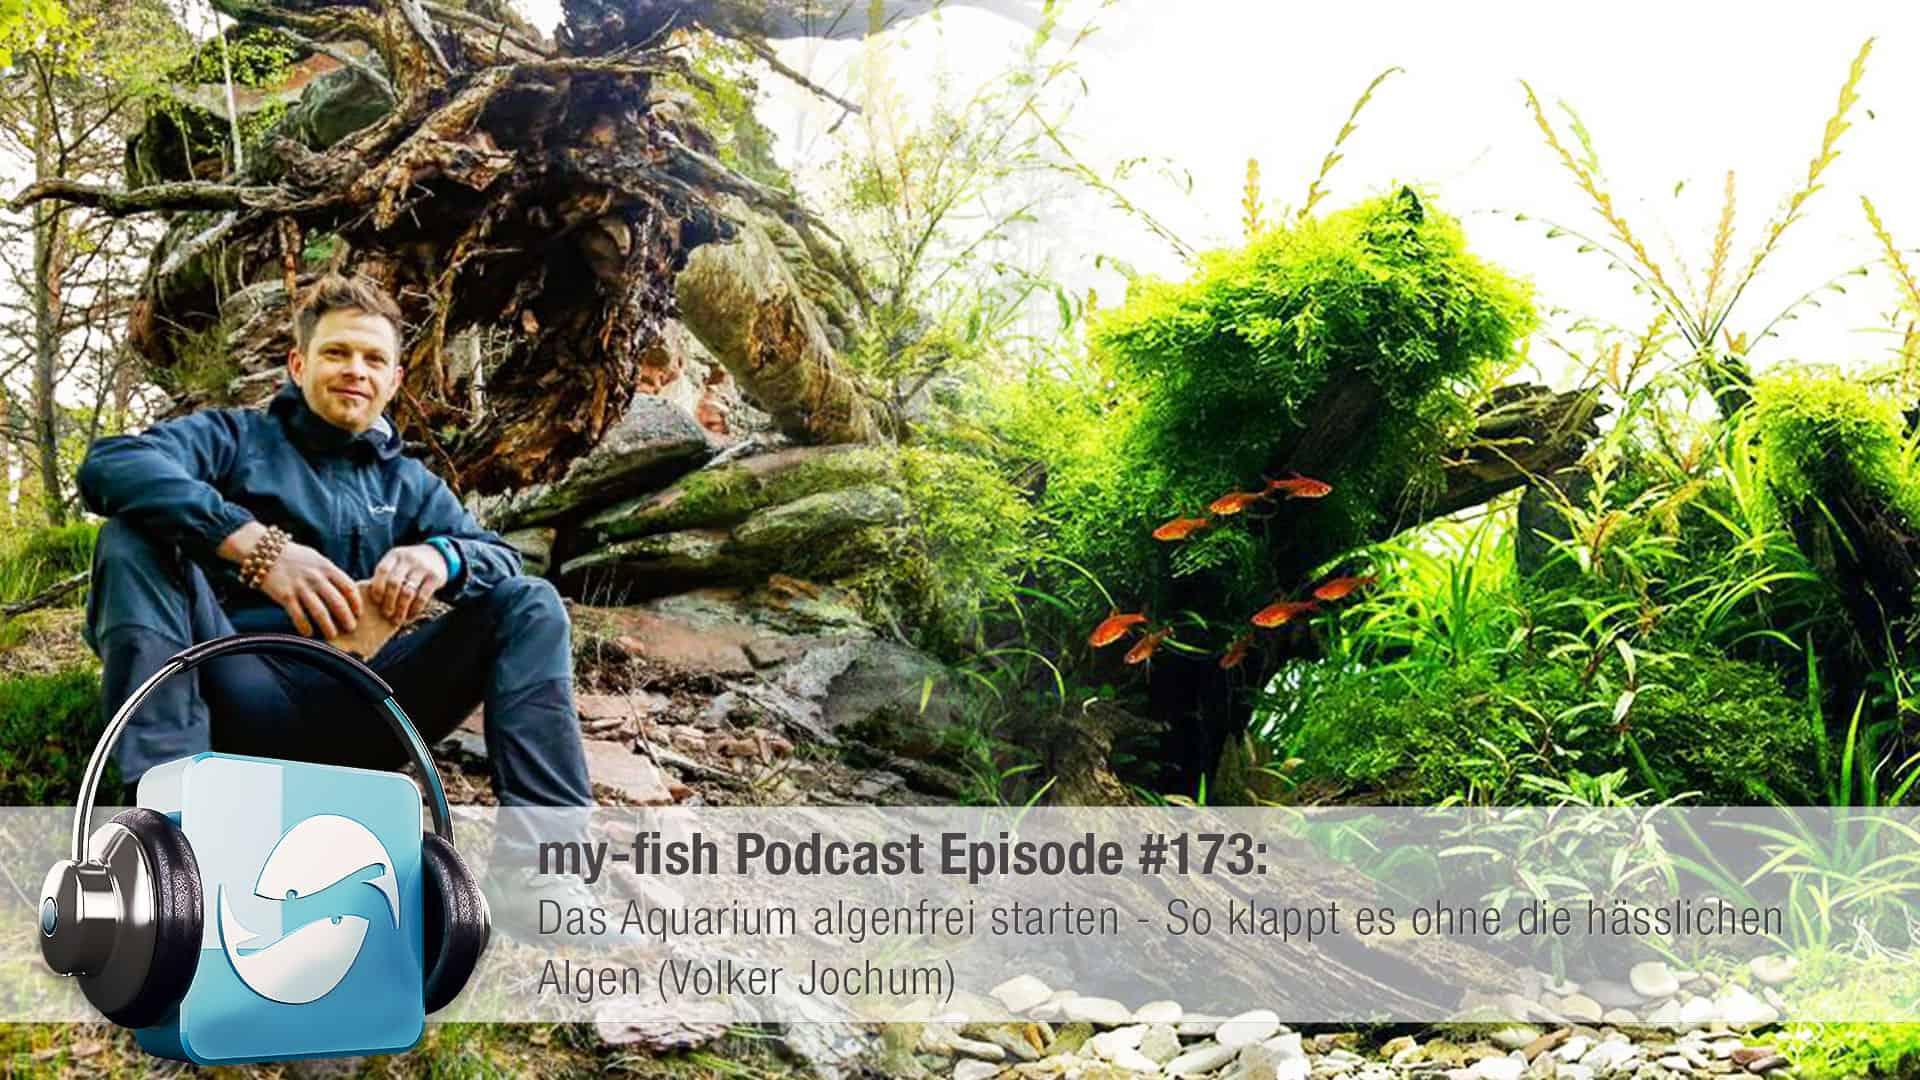 173 Das Aquarium algenfrei starten (Volker Jochum) 1